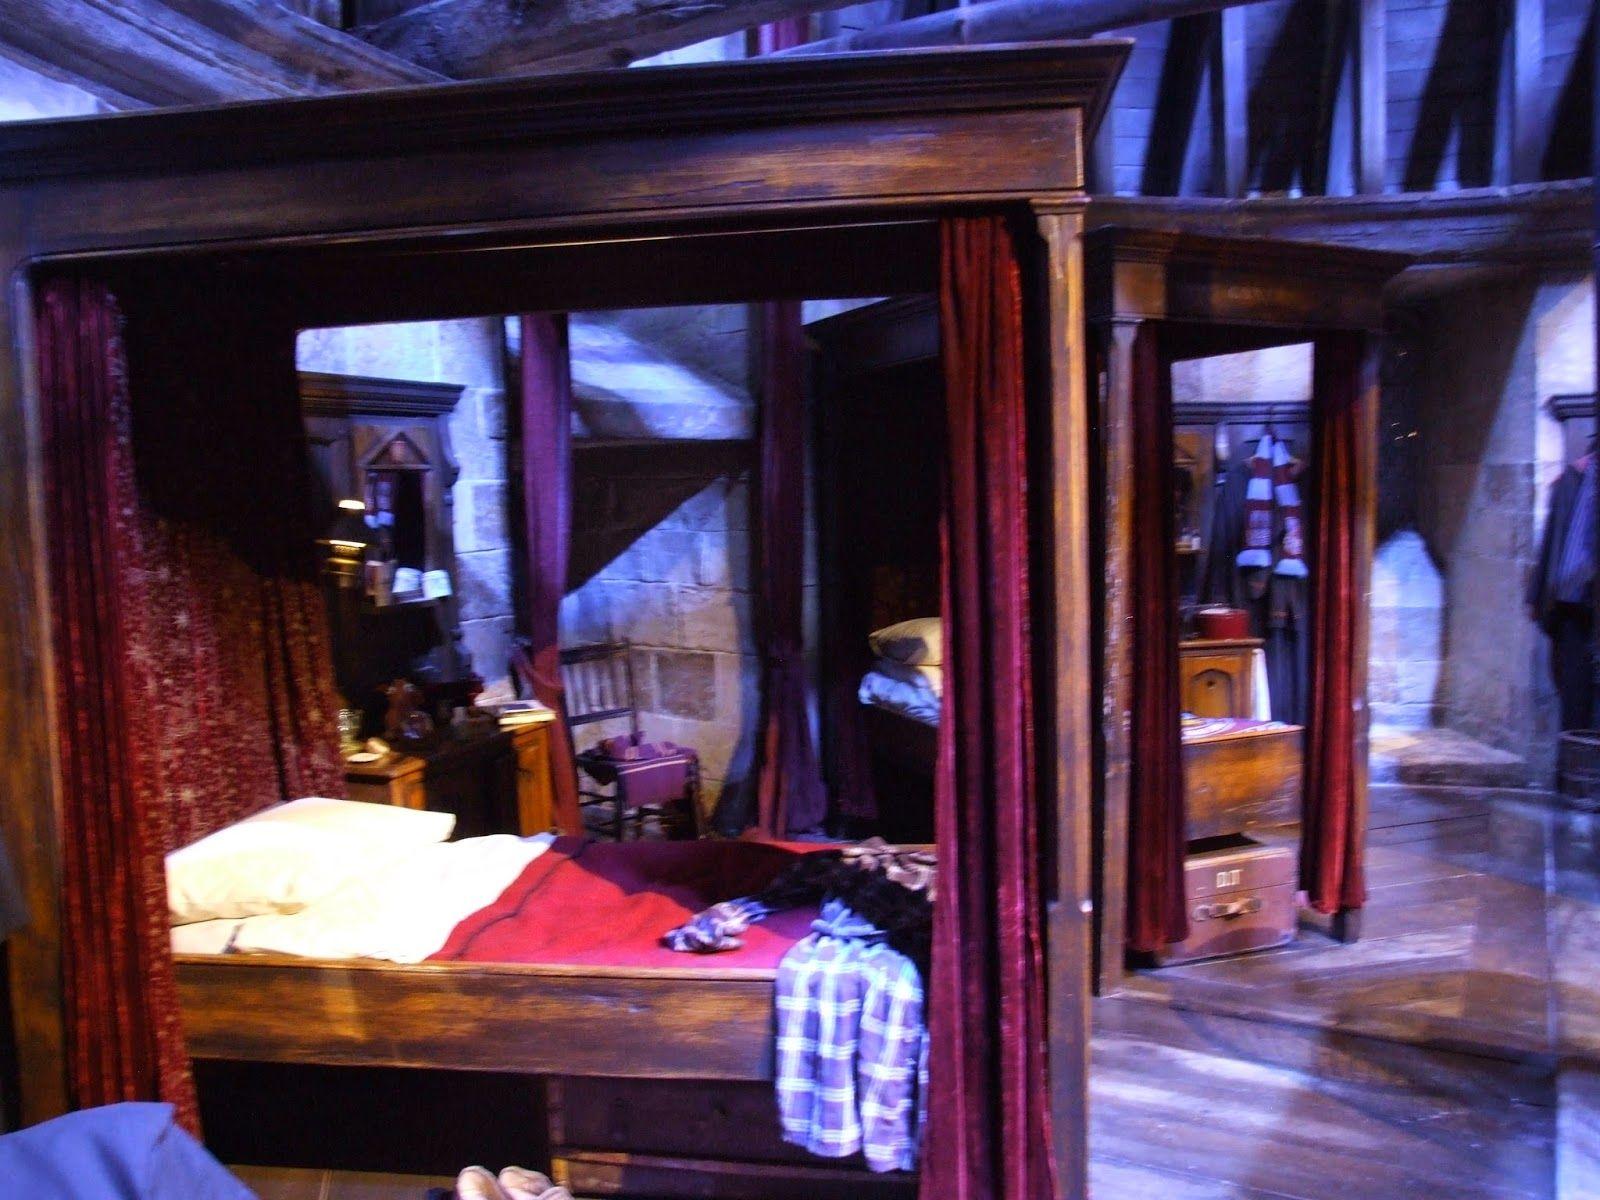 Gryffindor Boys Dormitory Harry Potter Room